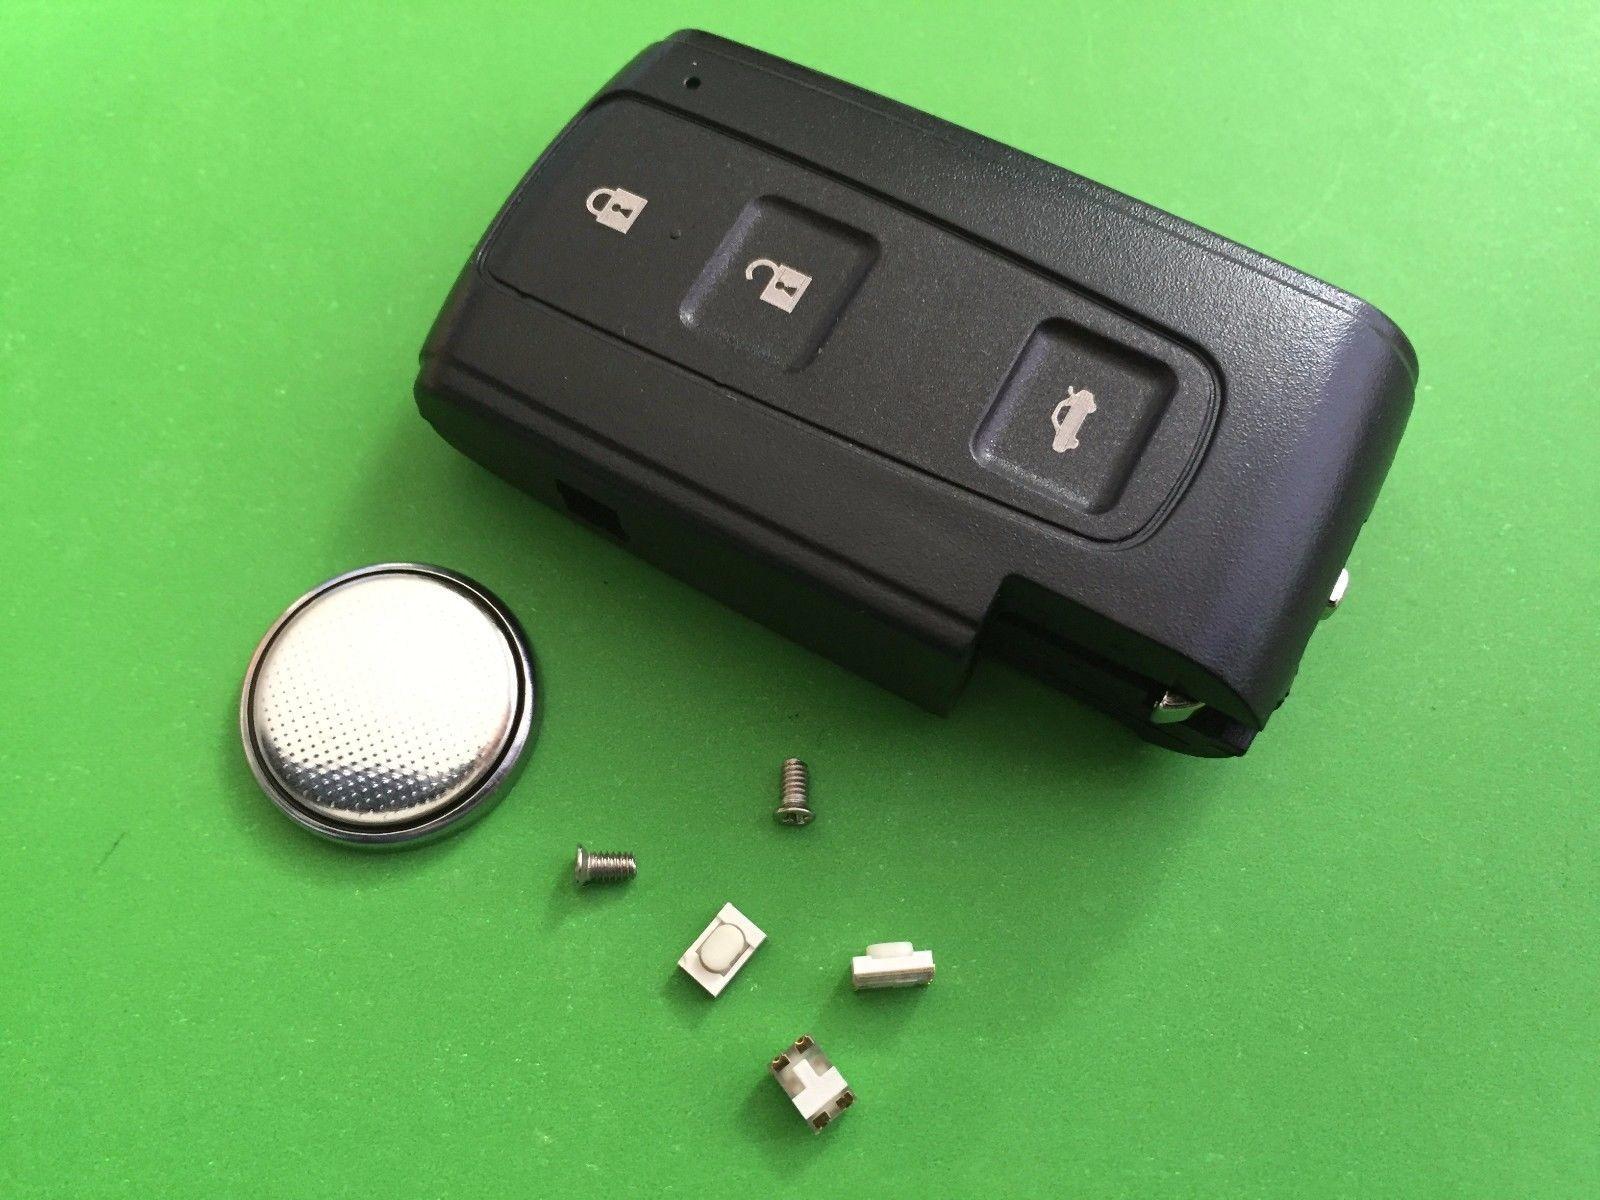 Repair kit for Toyota Corolla Verso Prius Crown 3 Button Smart Remote Key